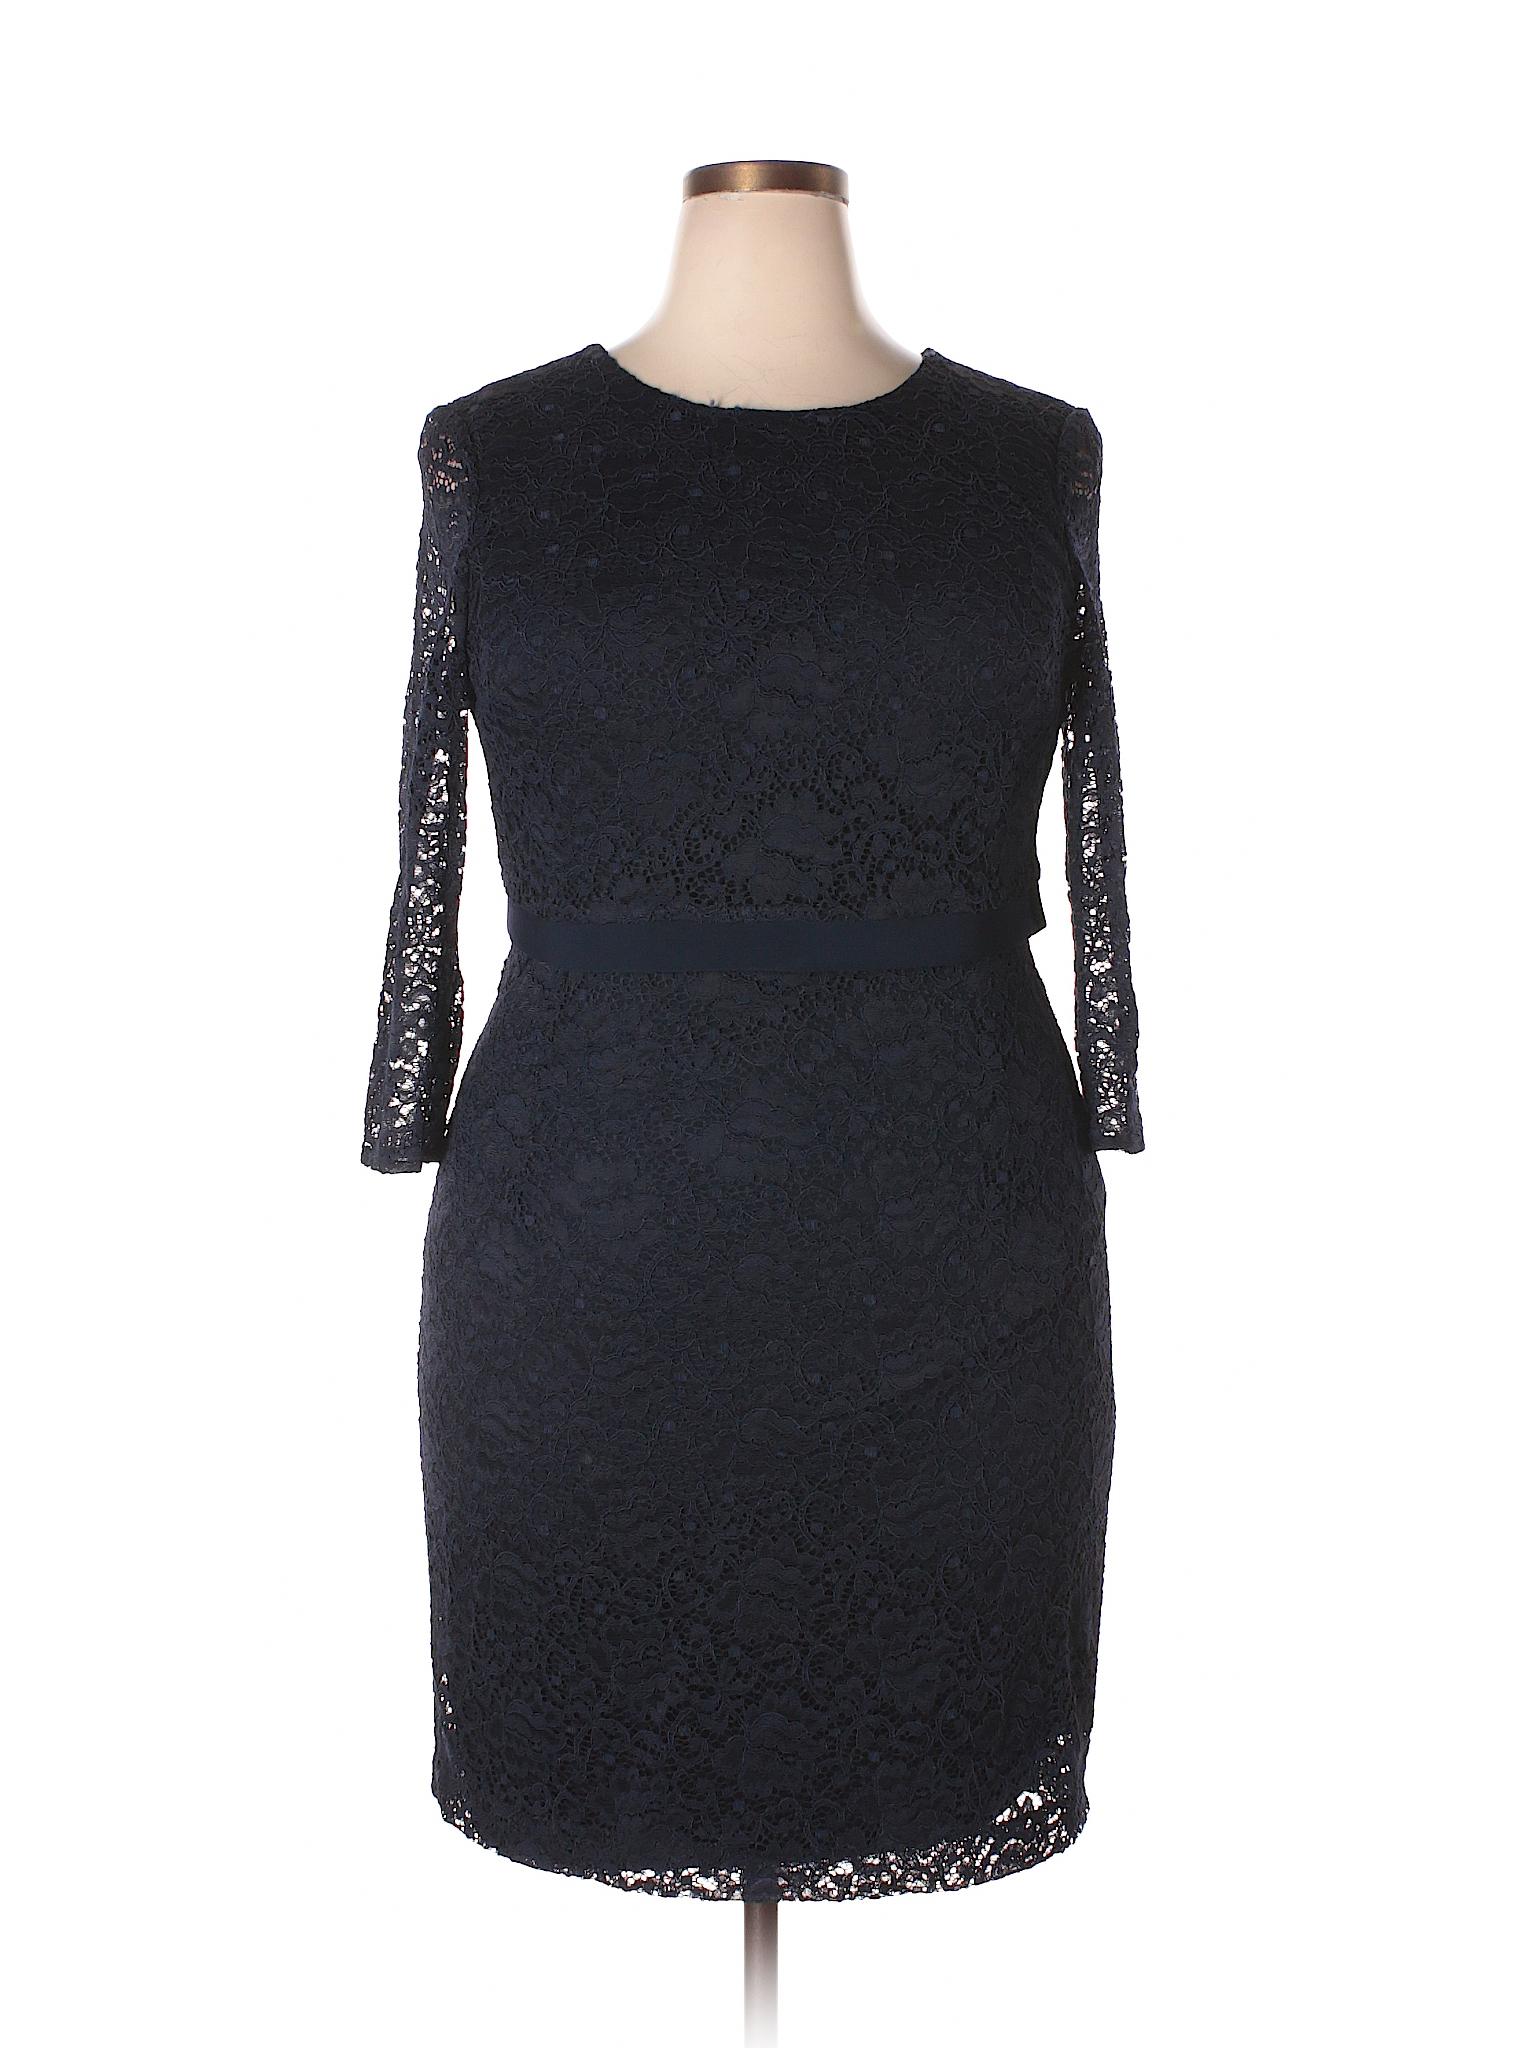 Casual Dress Selling American American Selling Living Xq8Iqa